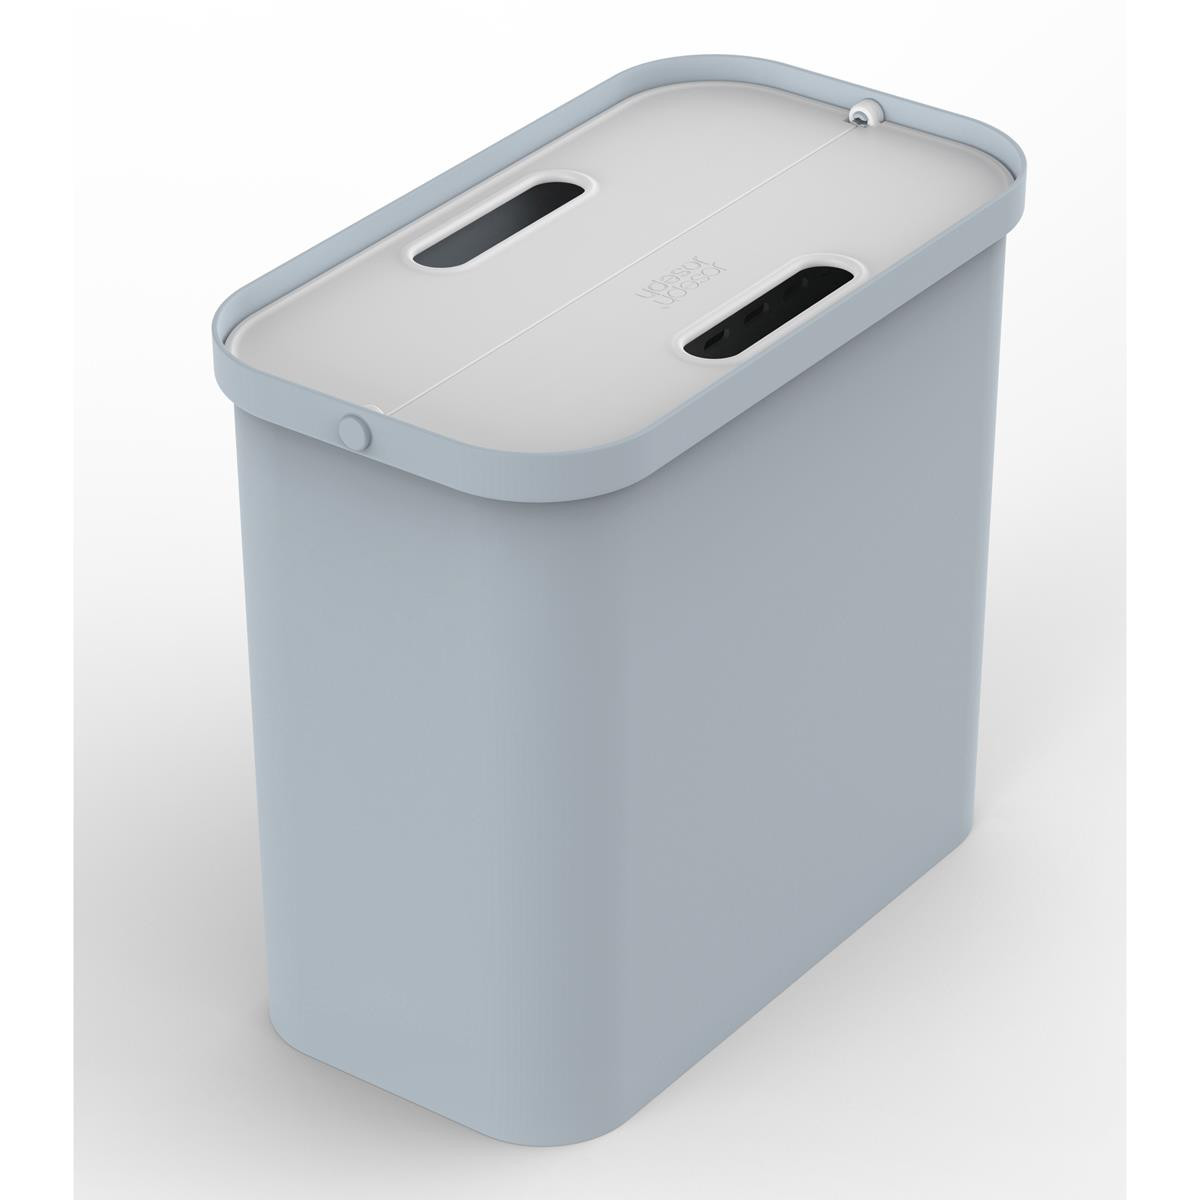 Joseph Joseph GoRecycle 28L Recycling Caddy Set